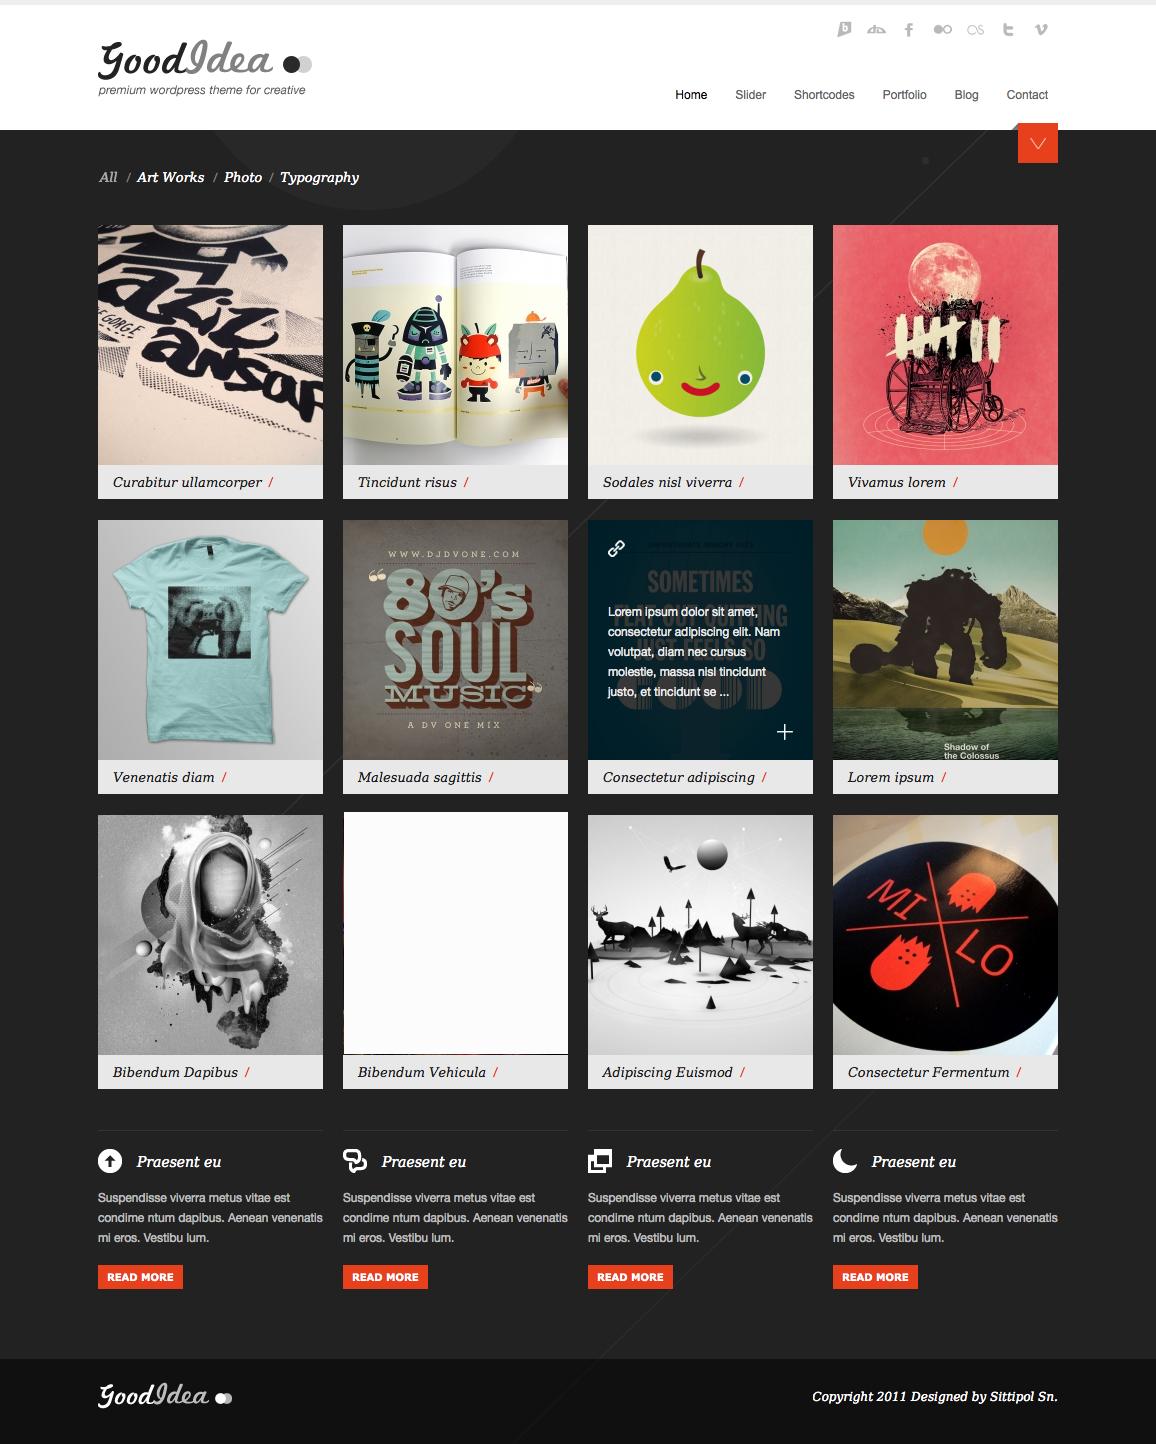 Goodidea - creative wordpress theme - homepage with dark